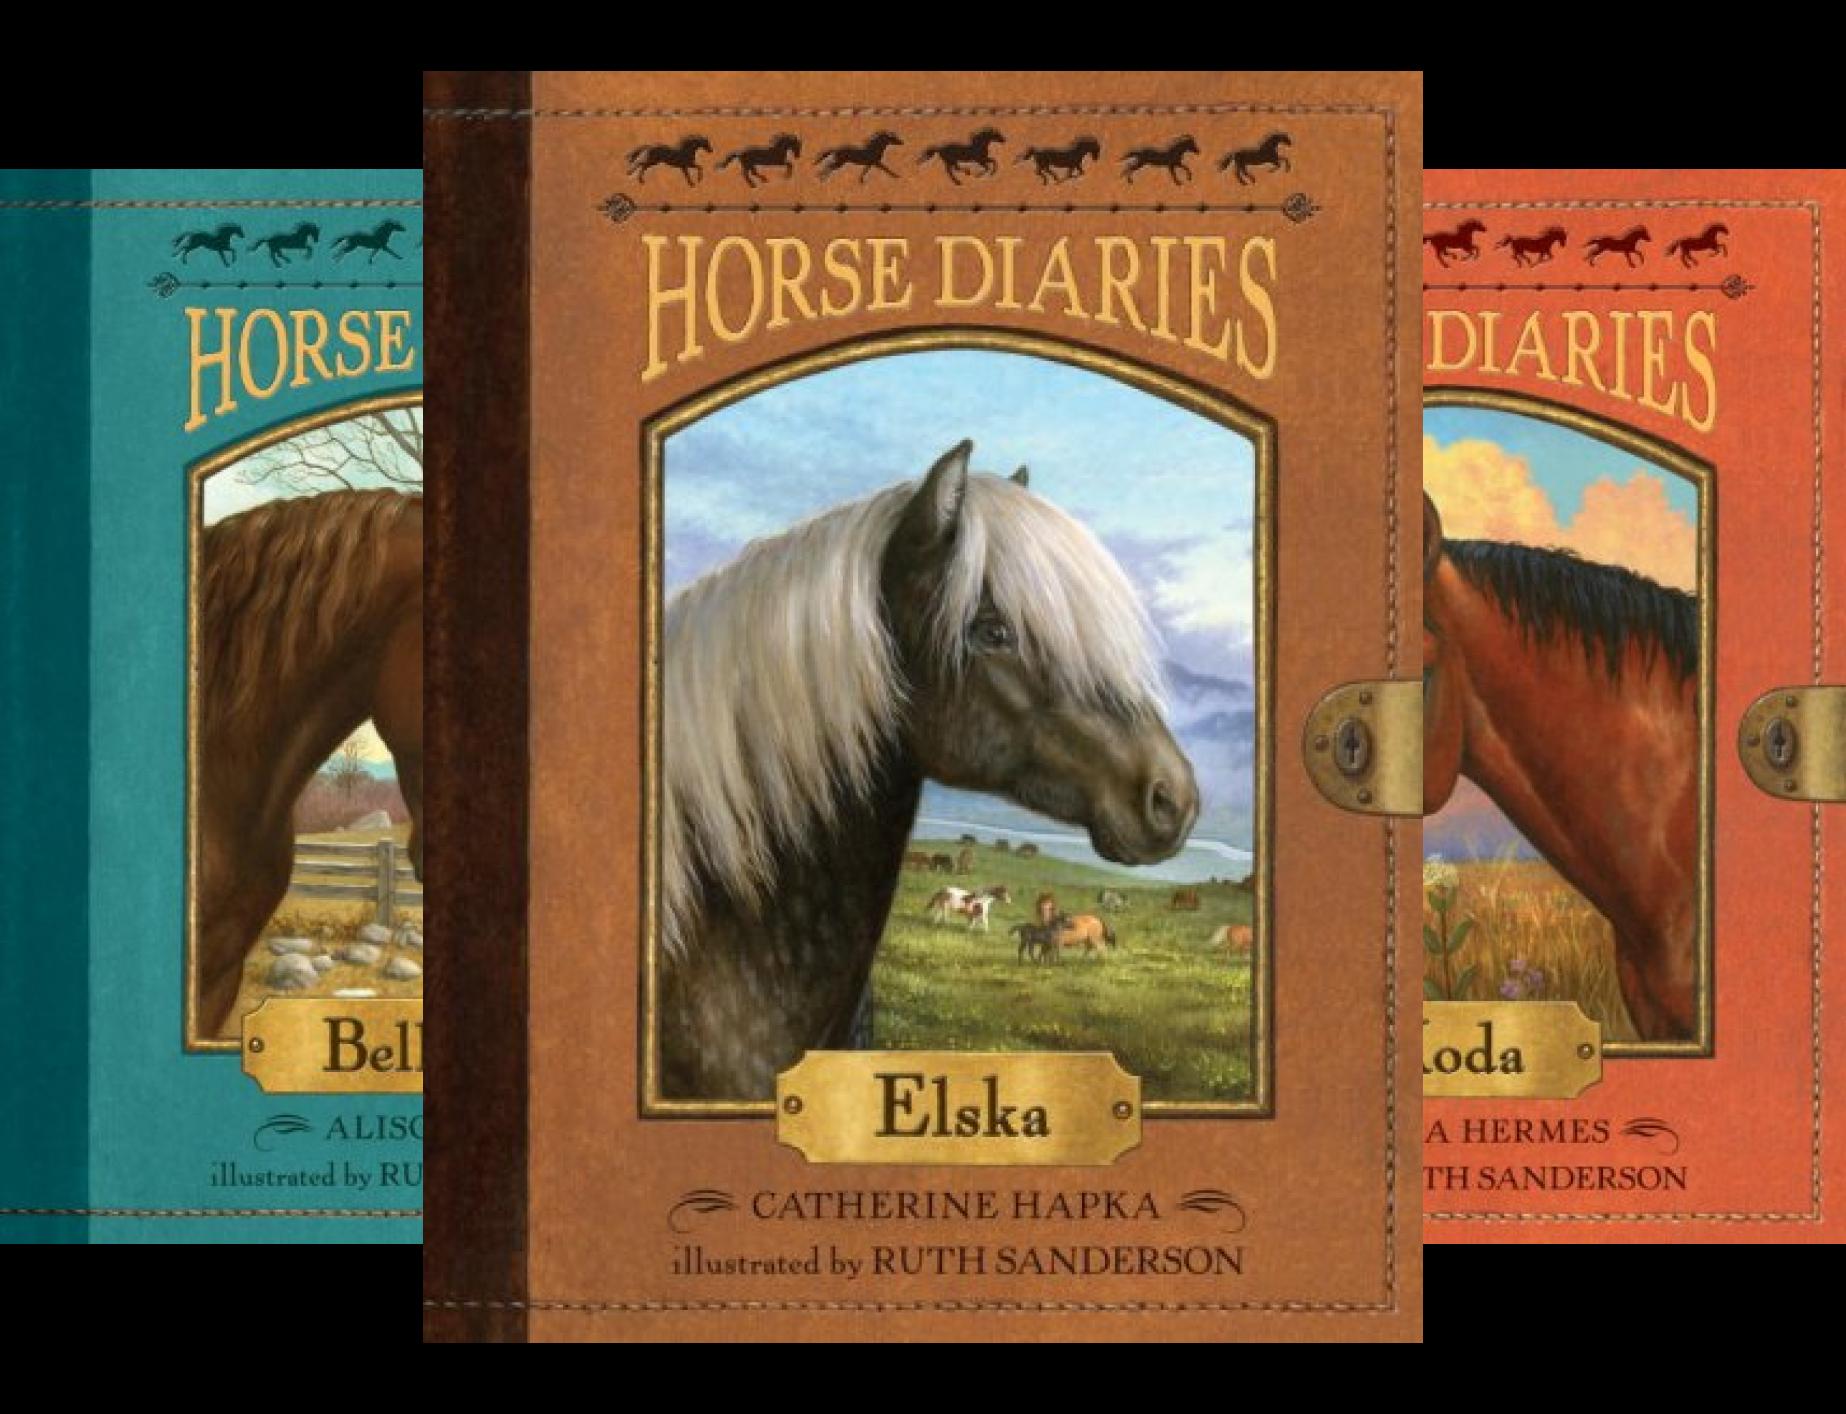 horse-diaries-series-15-book-series